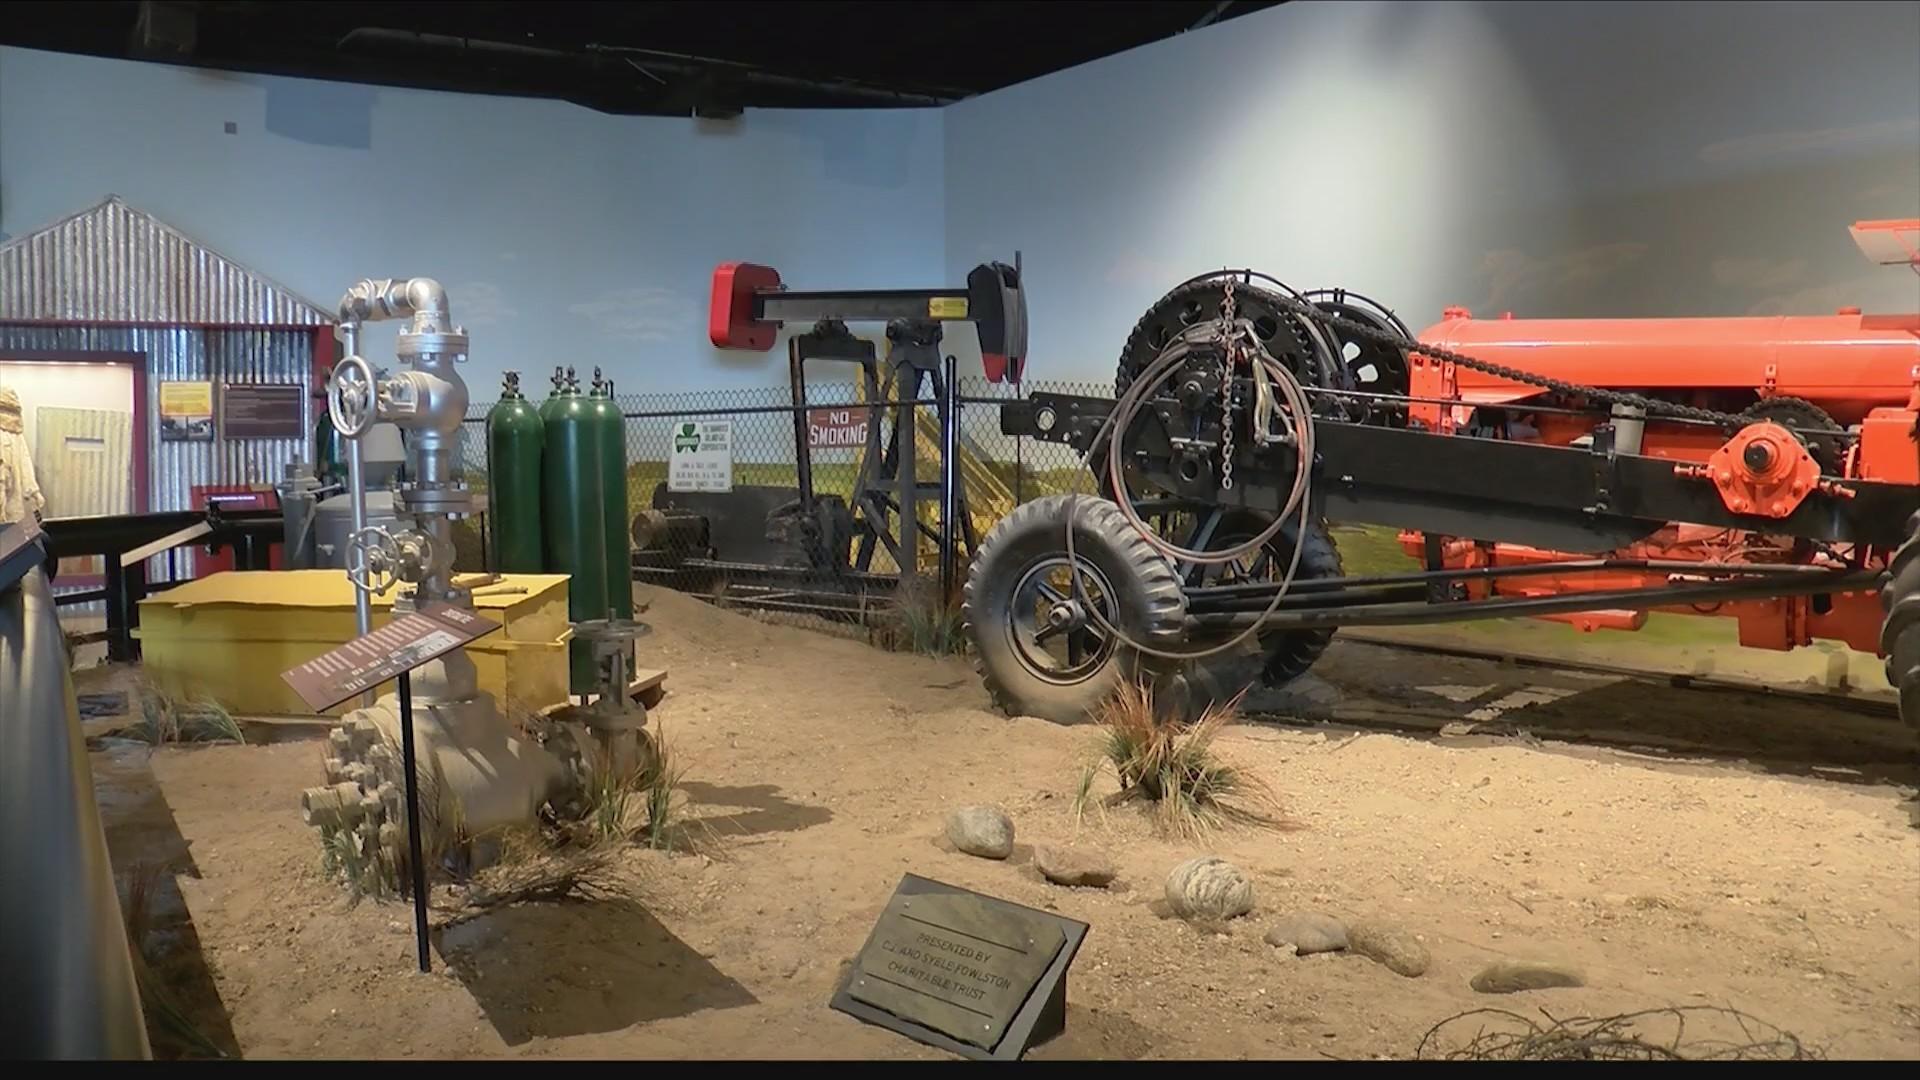 Panhandle-Plains Historical Museum Facing Potential Funding Cuts